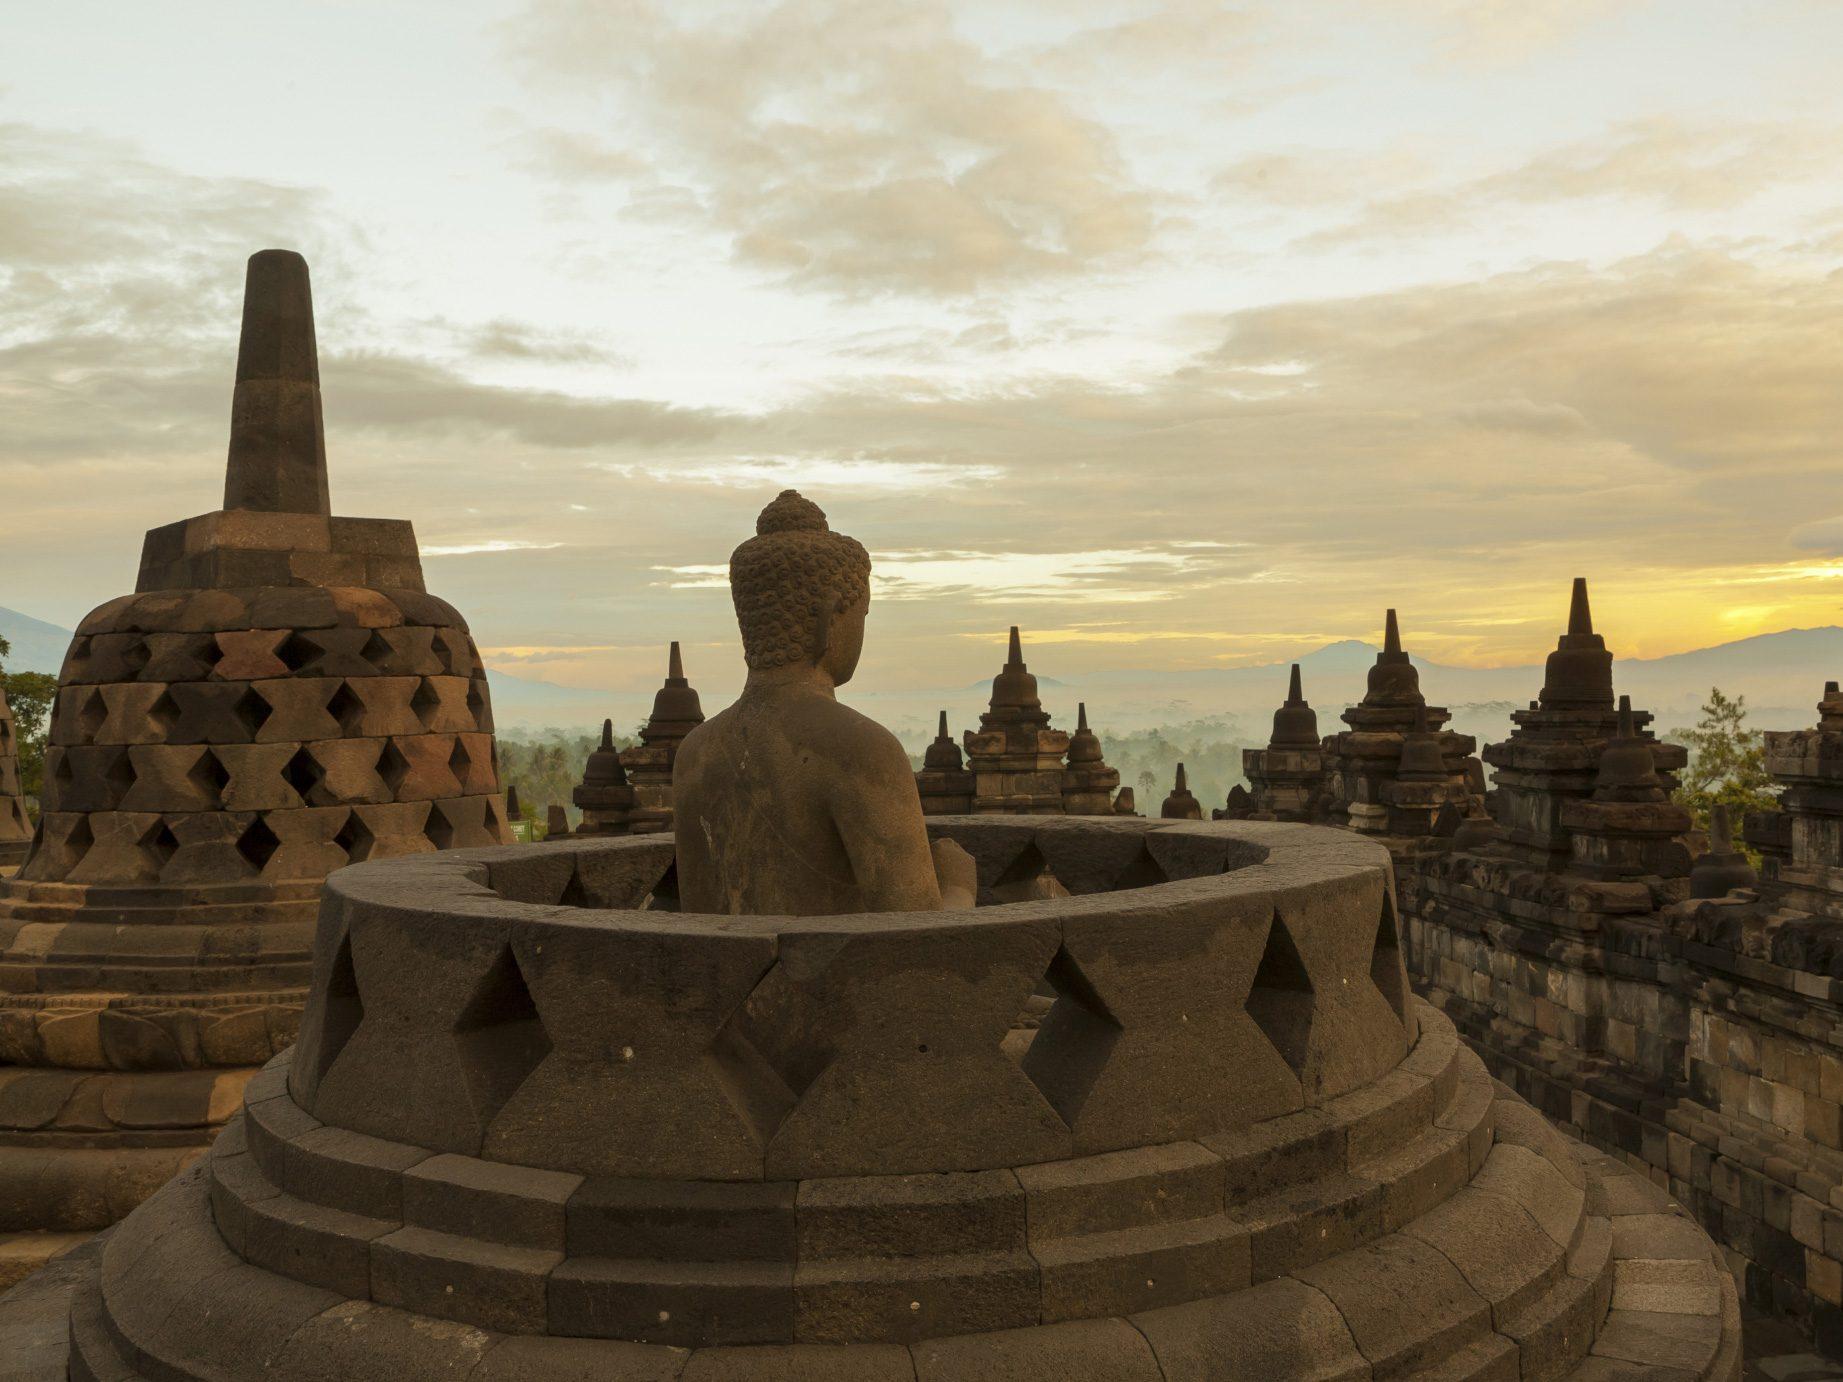 Construction Wonder of Antiquity: Borobudur - Indonesia